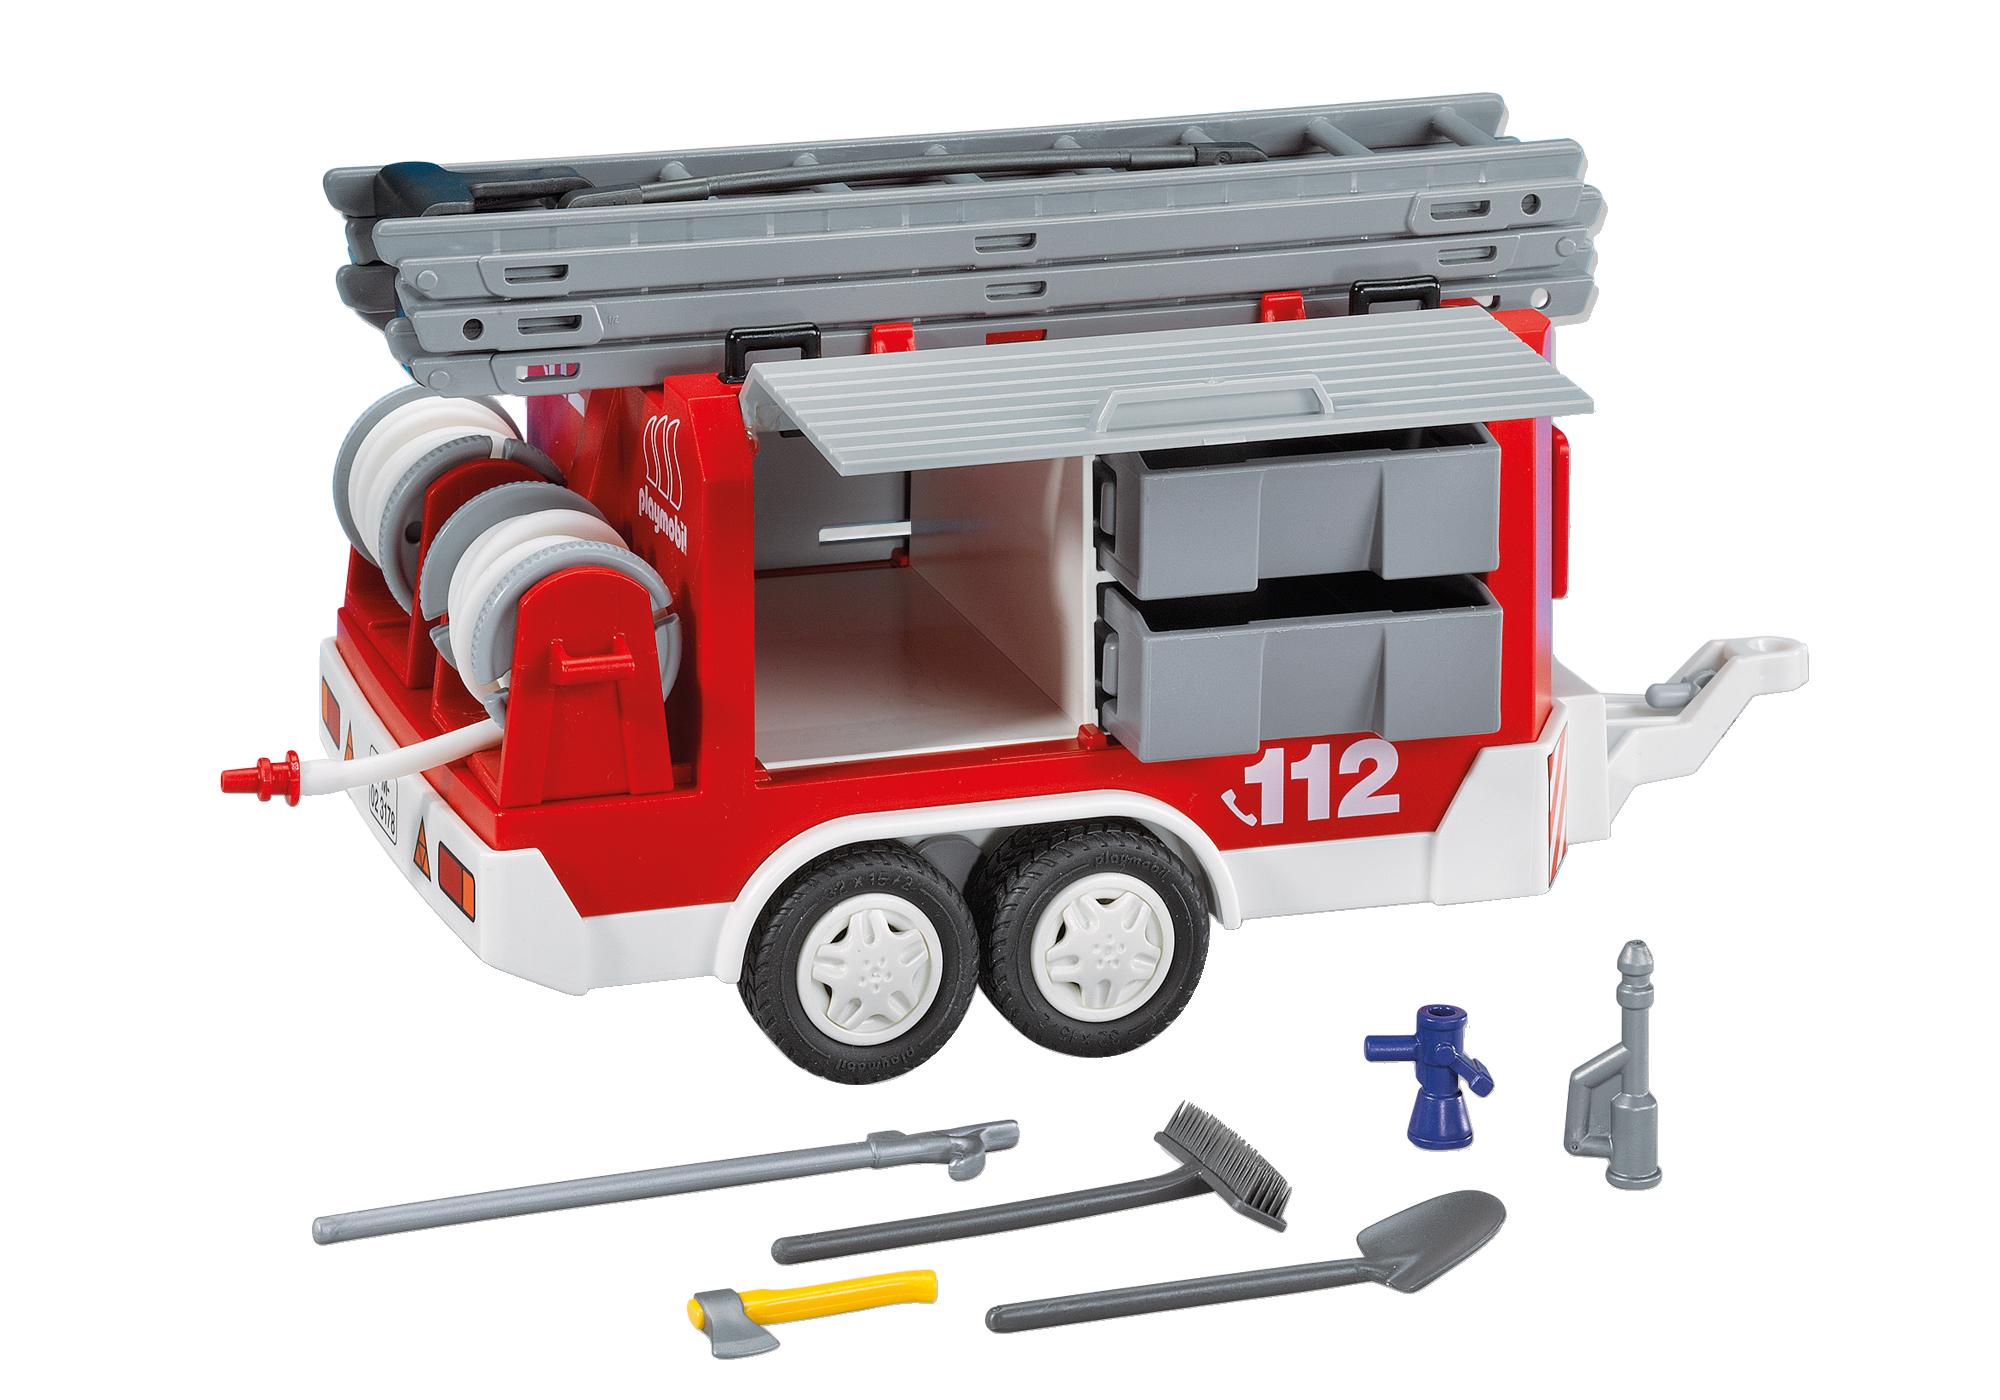 http://media.playmobil.com/i/playmobil/7485_product_detail/Feuerwehr-Anhänger